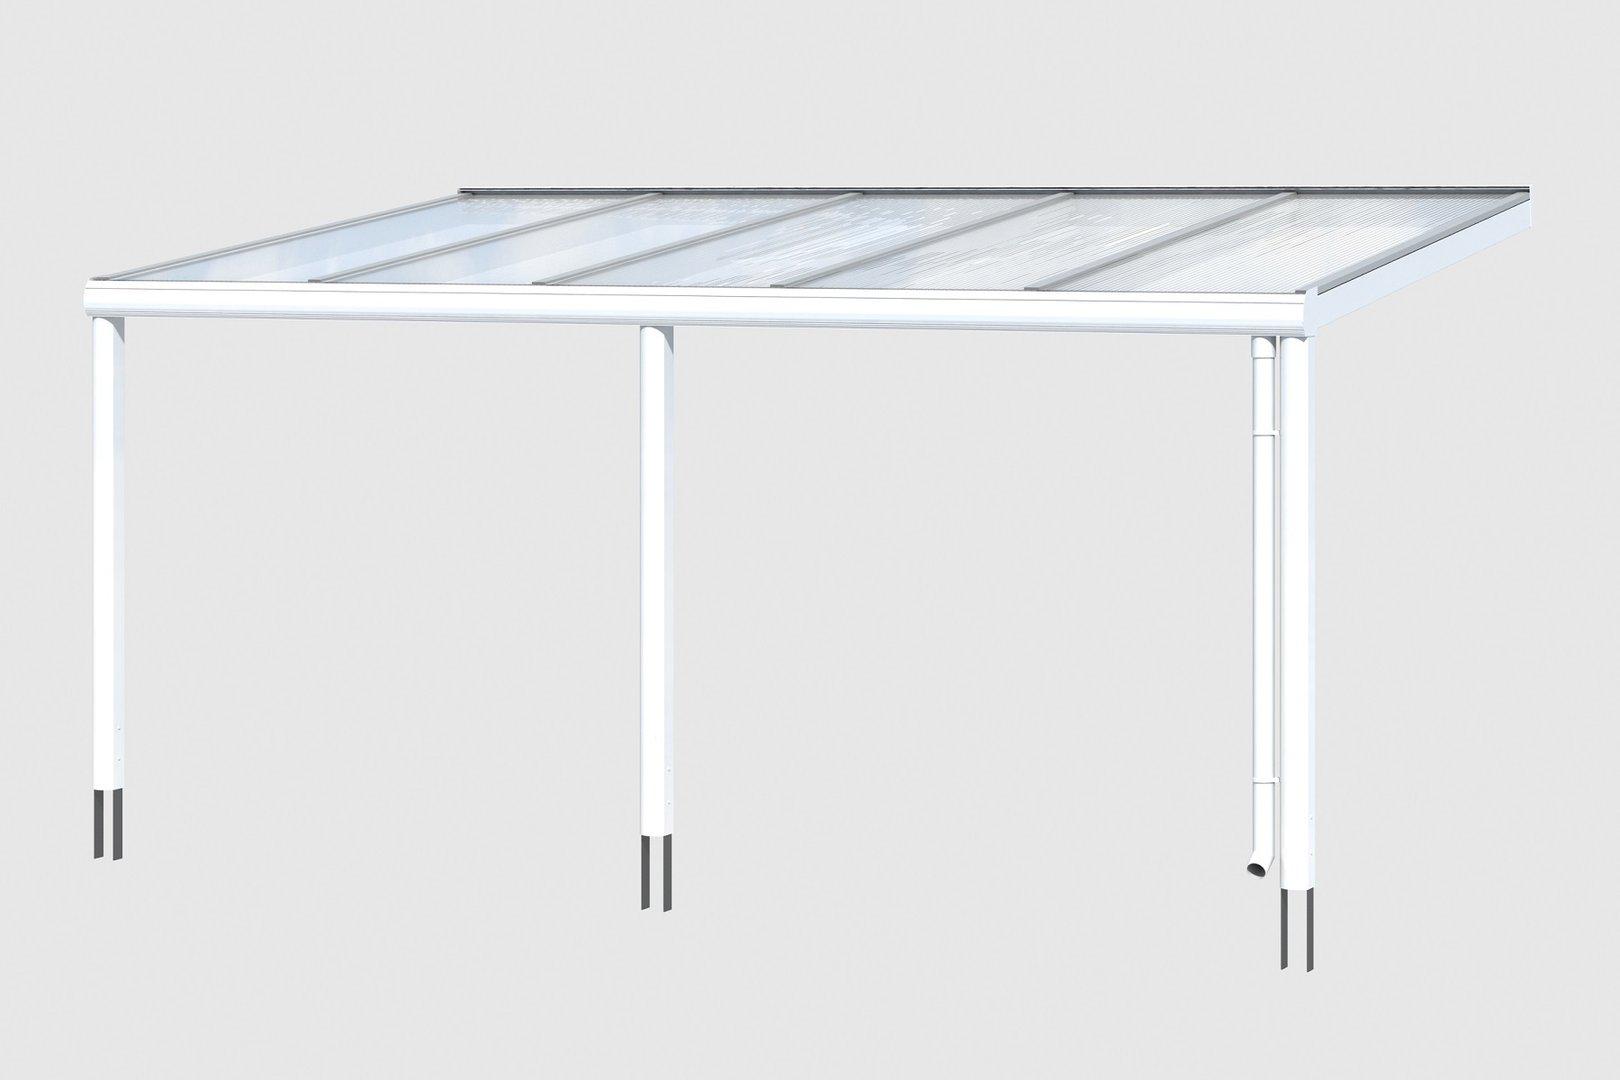 terrassen berdachung garda 5 alu sams gartenhaus shop. Black Bedroom Furniture Sets. Home Design Ideas